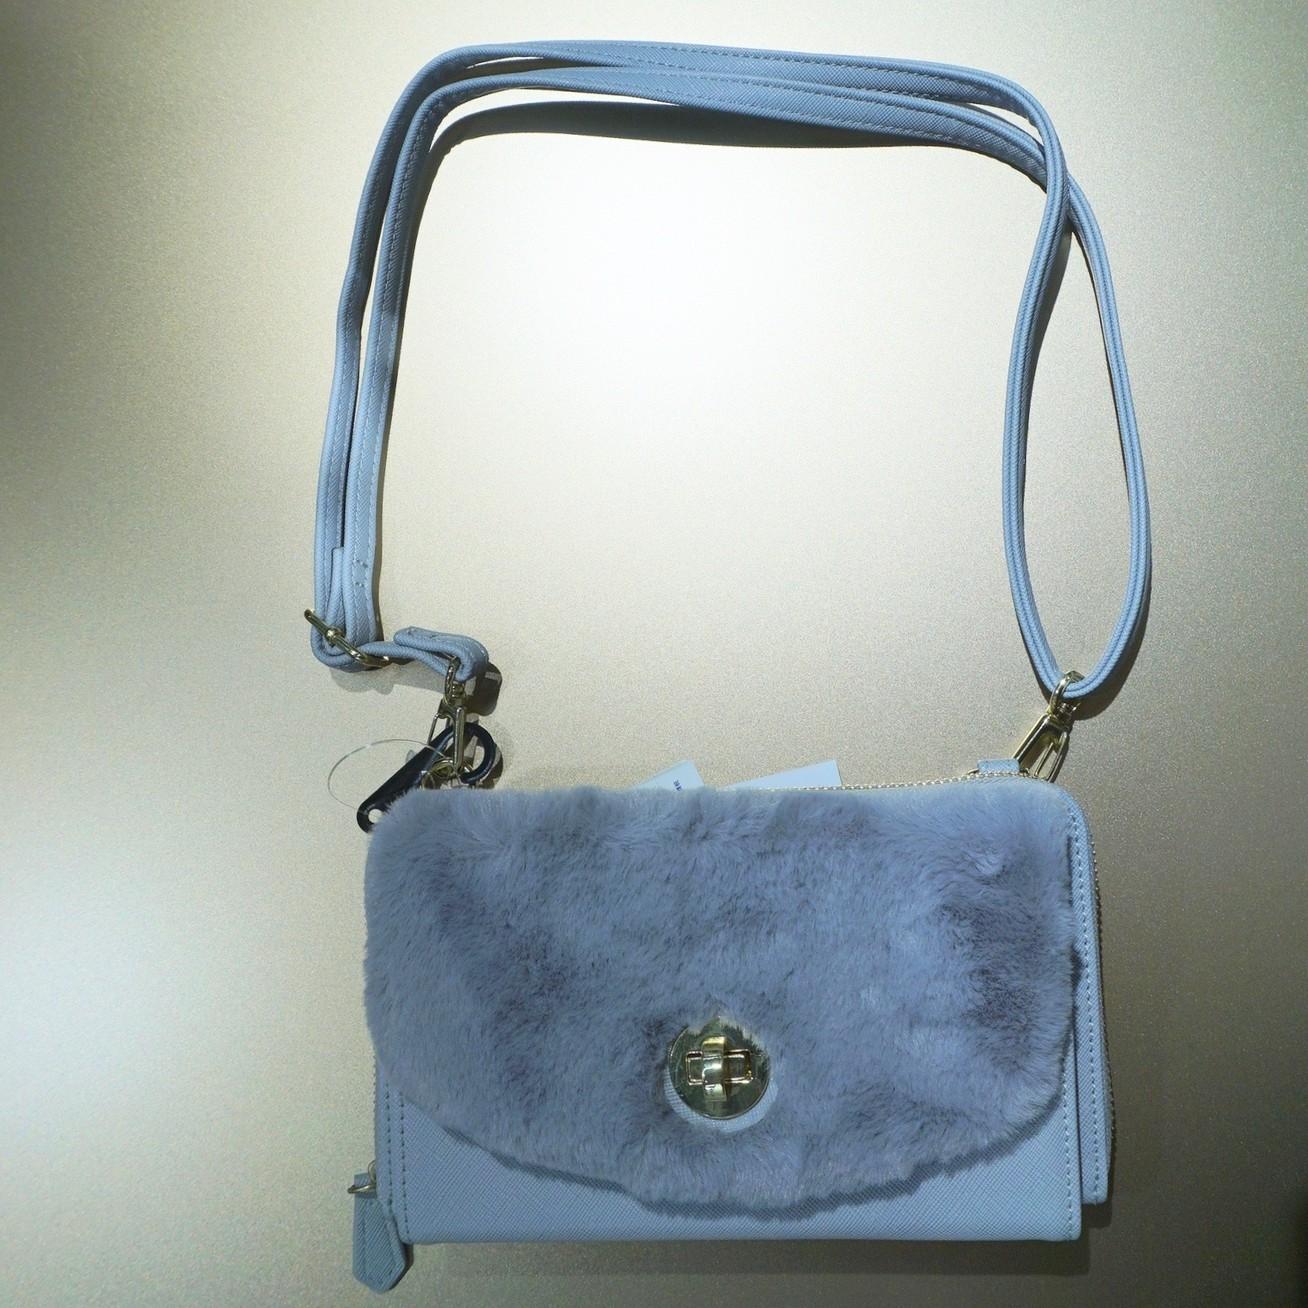 GU(ジーユー)のフェイクファーつきウォレットバッグ